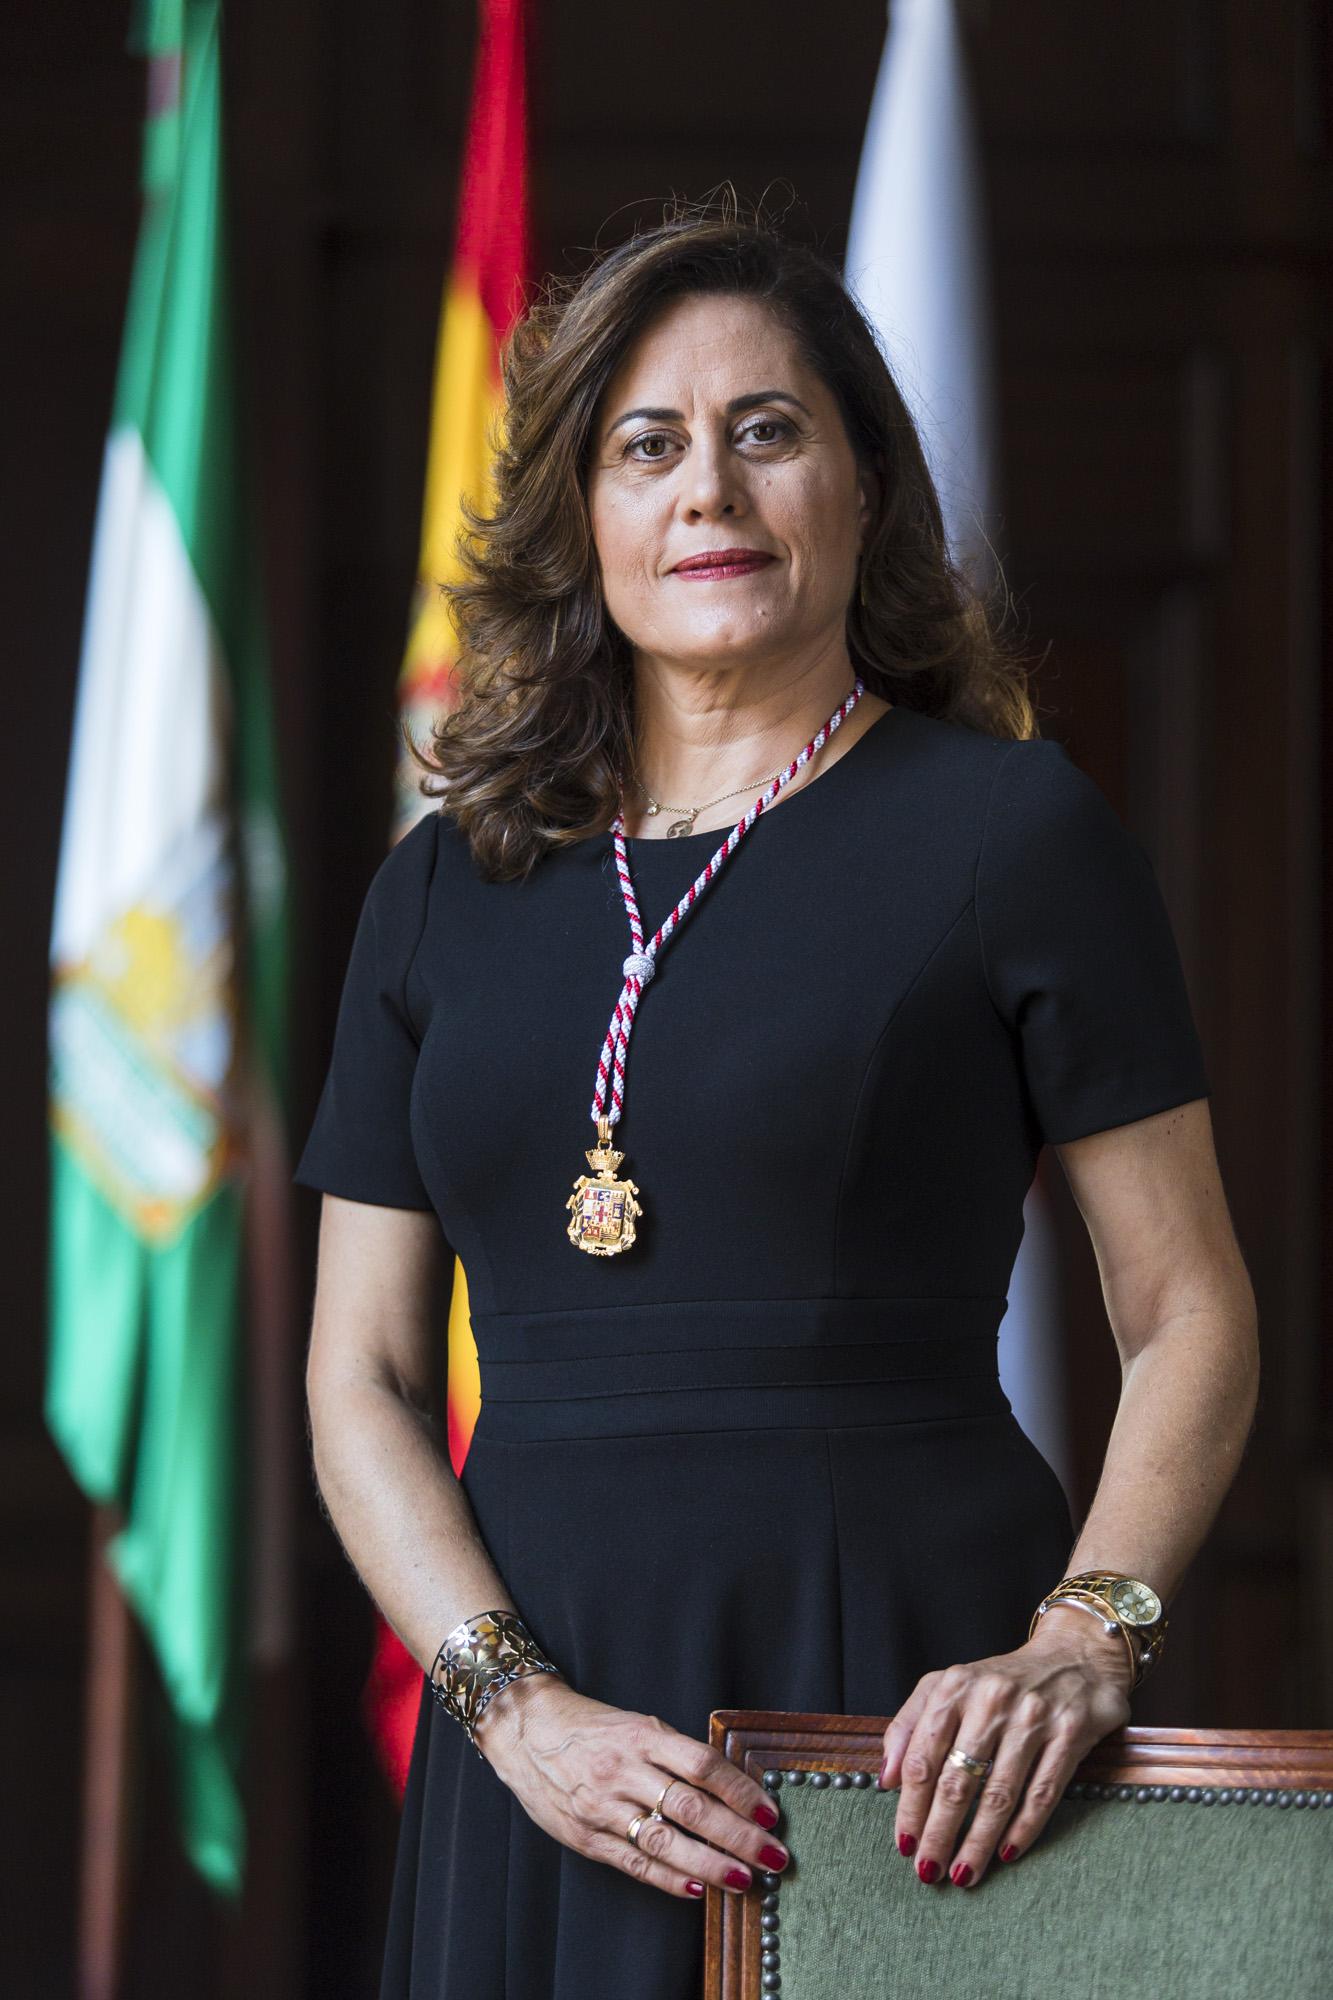 Carmen María Aguilar Carreño